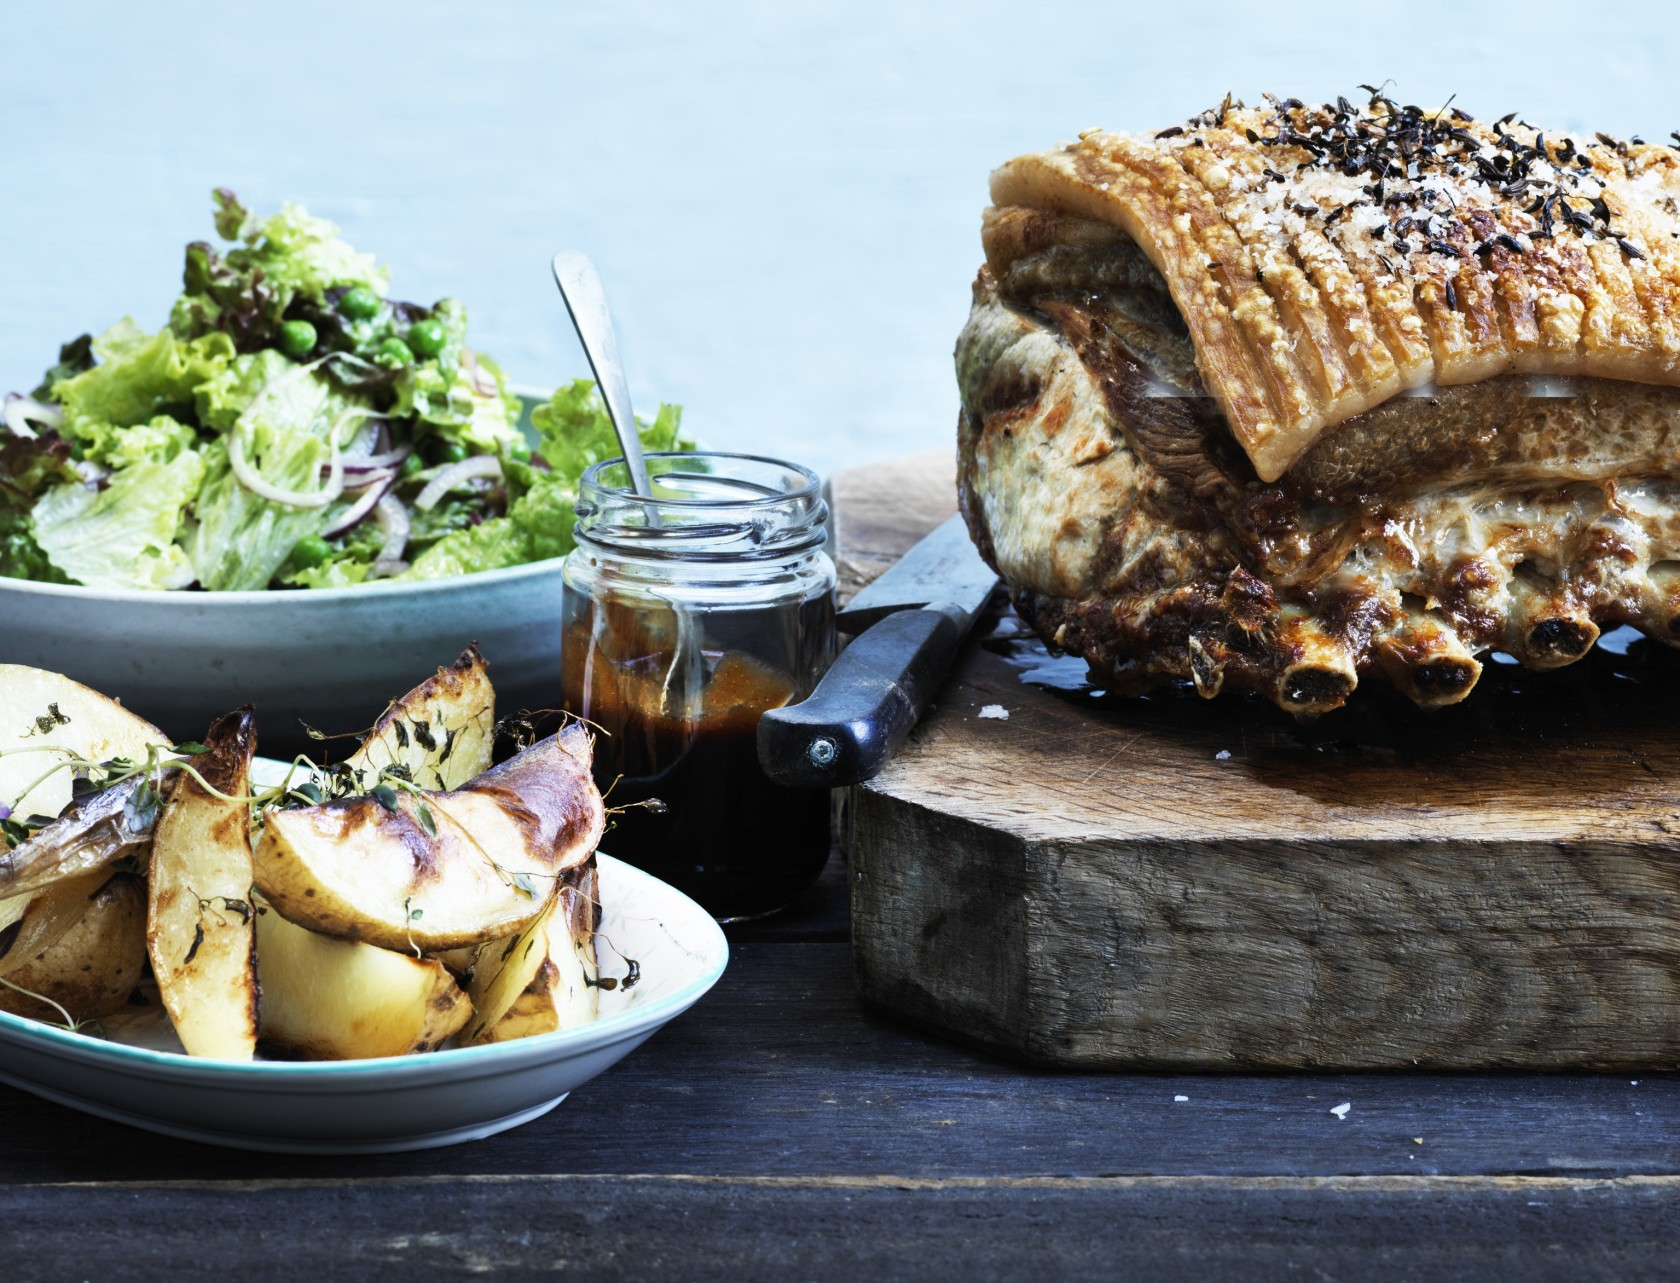 Flæskesteg med grove fritter og barbecuesauce - virkelig lækker opskrift!